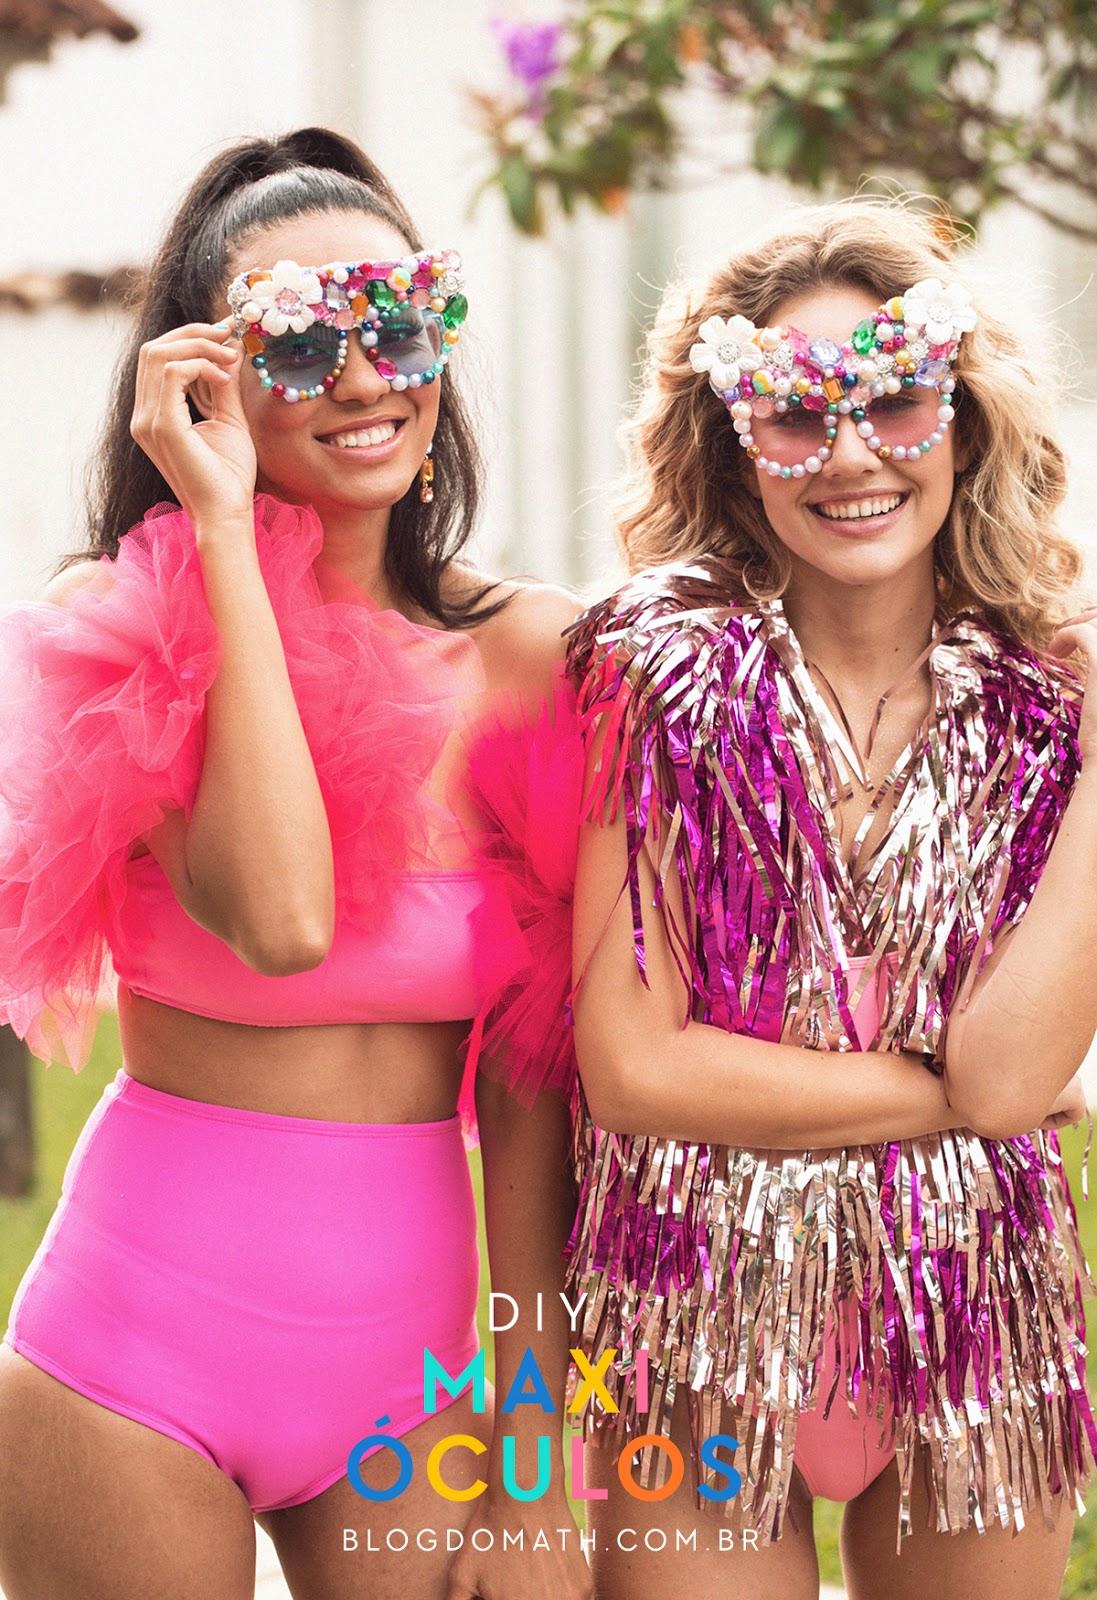 oculos de sol bloquinho de carnaval